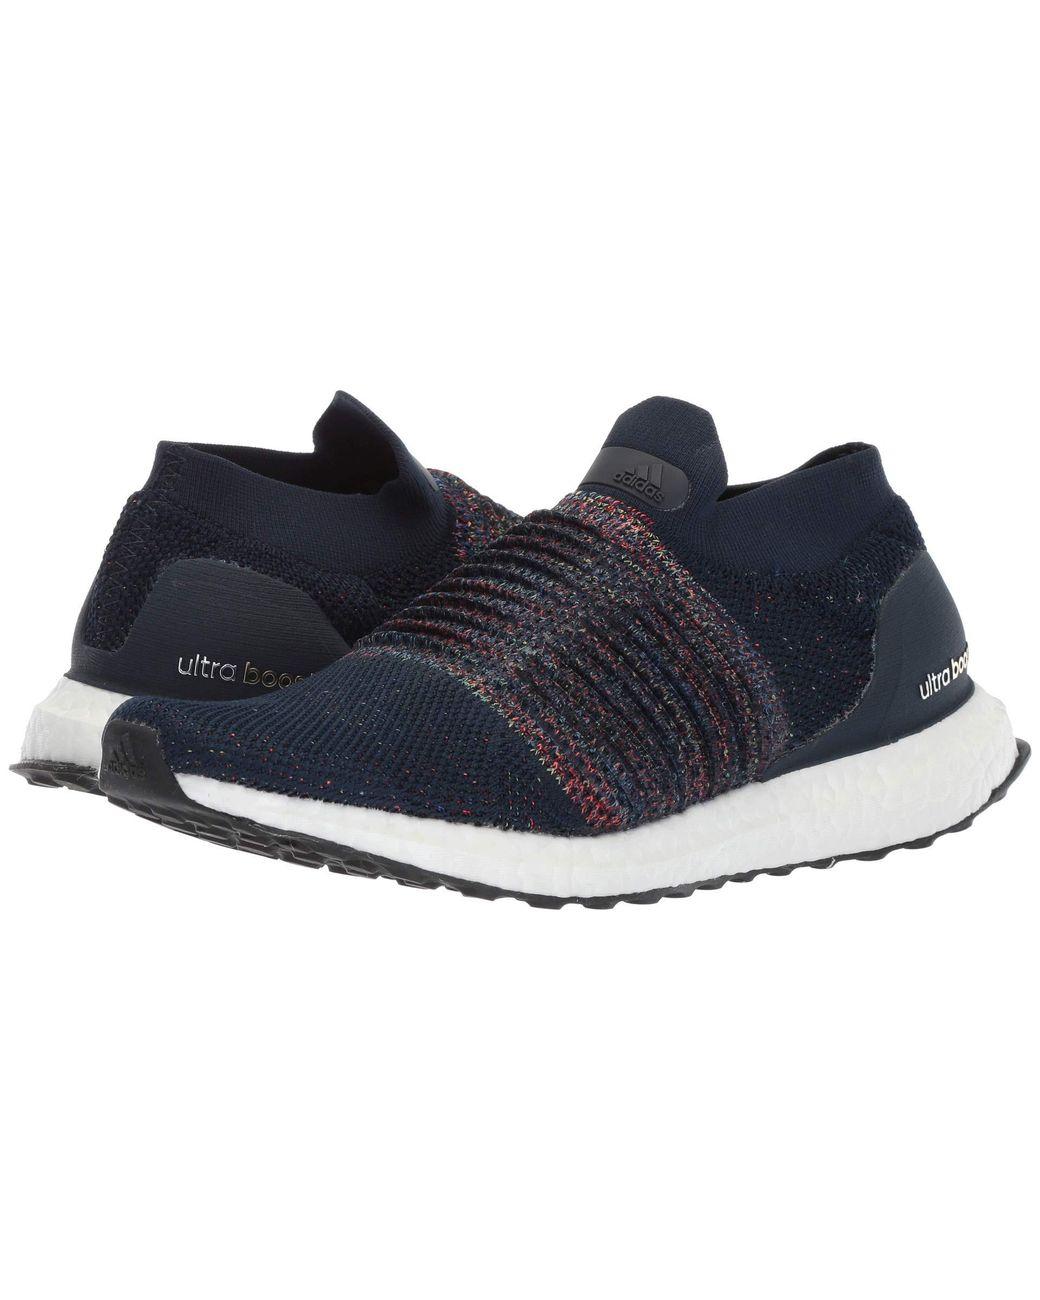 1d5b7eaf37b51 Lyst - adidas Originals Ultraboost Laceless (collegiate Navy white black) Men s  Running Shoes in Blue for Men